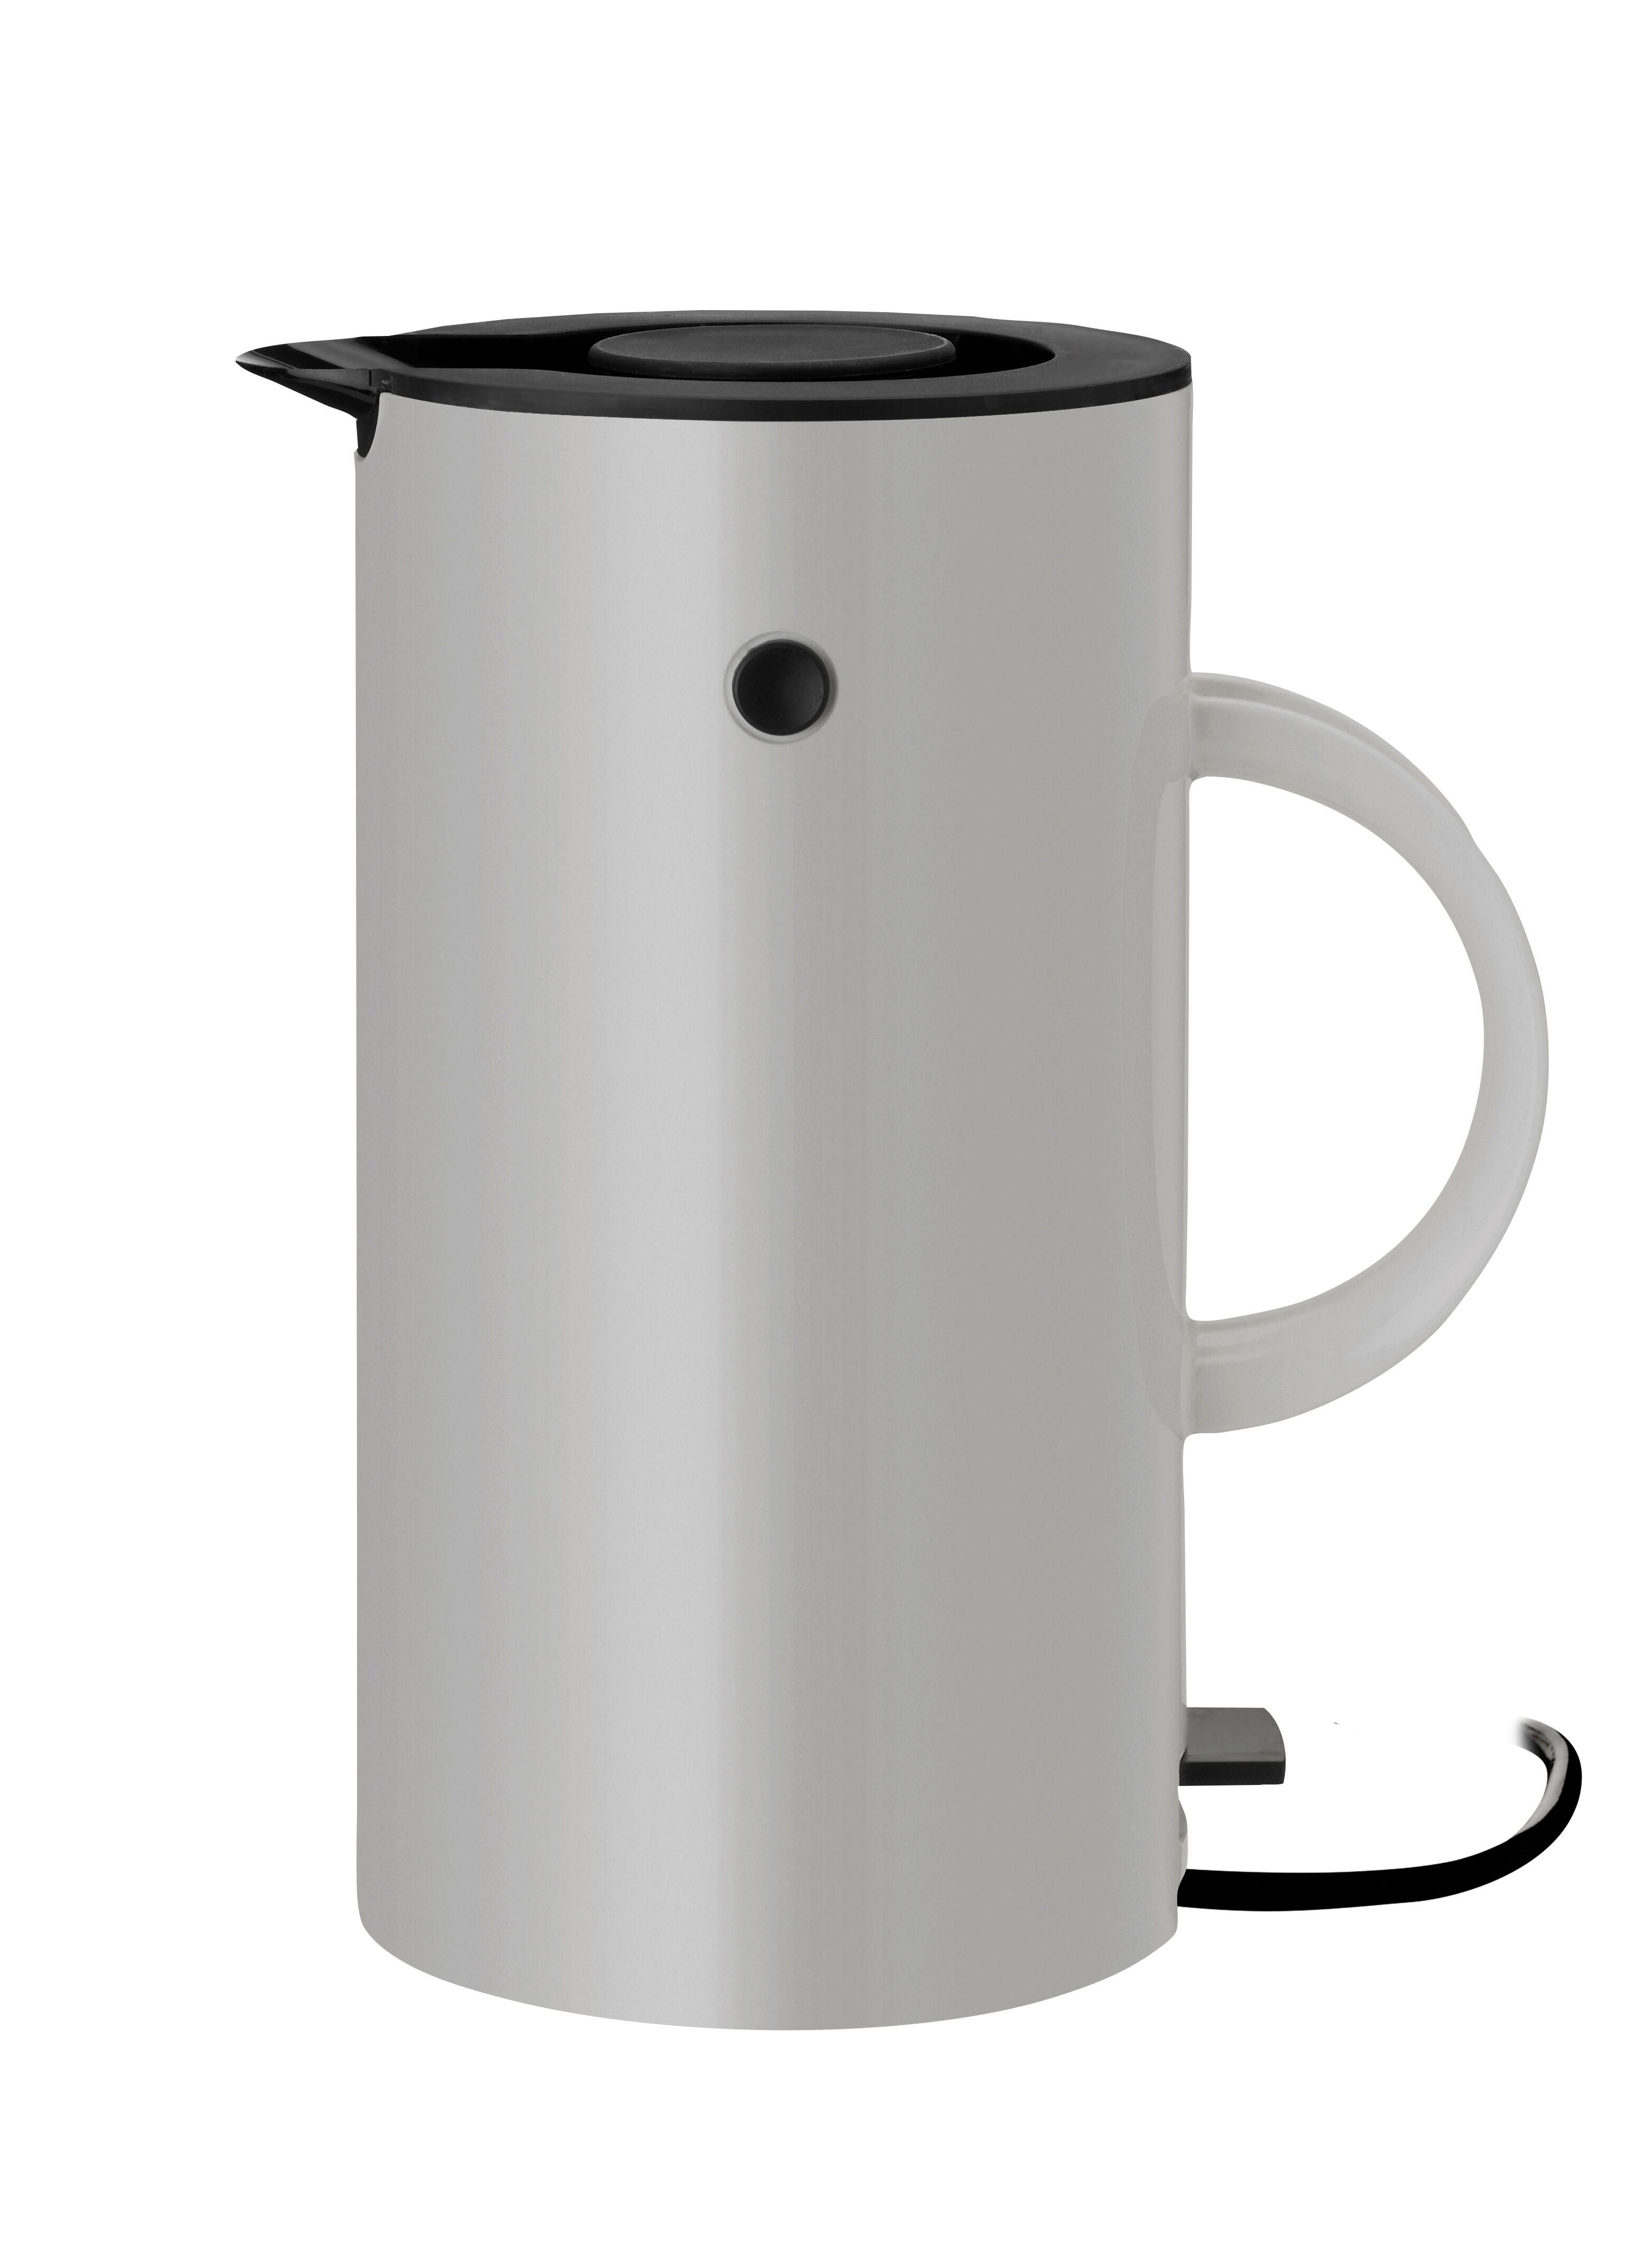 Stelton - EM77 Electric Kettle 1,5 L - Light Grey (890-2)